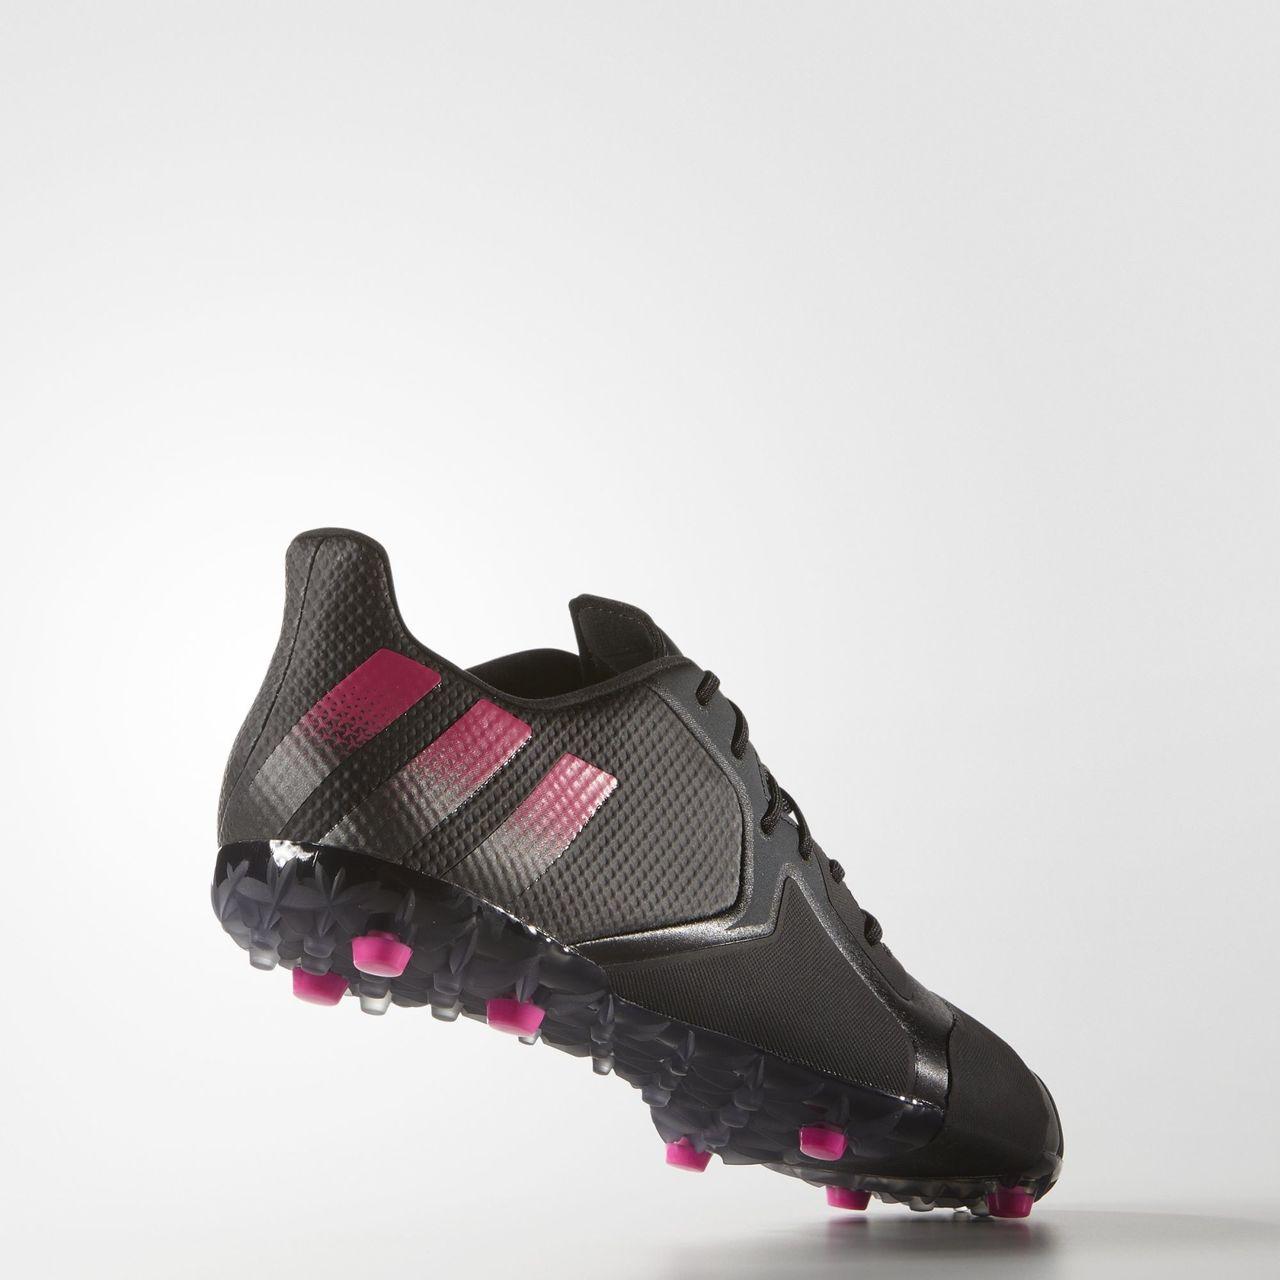 Adidas ACE 16.1 TKRZ - Core Black   Shock Pink   Dark Grey ... d25b95d16